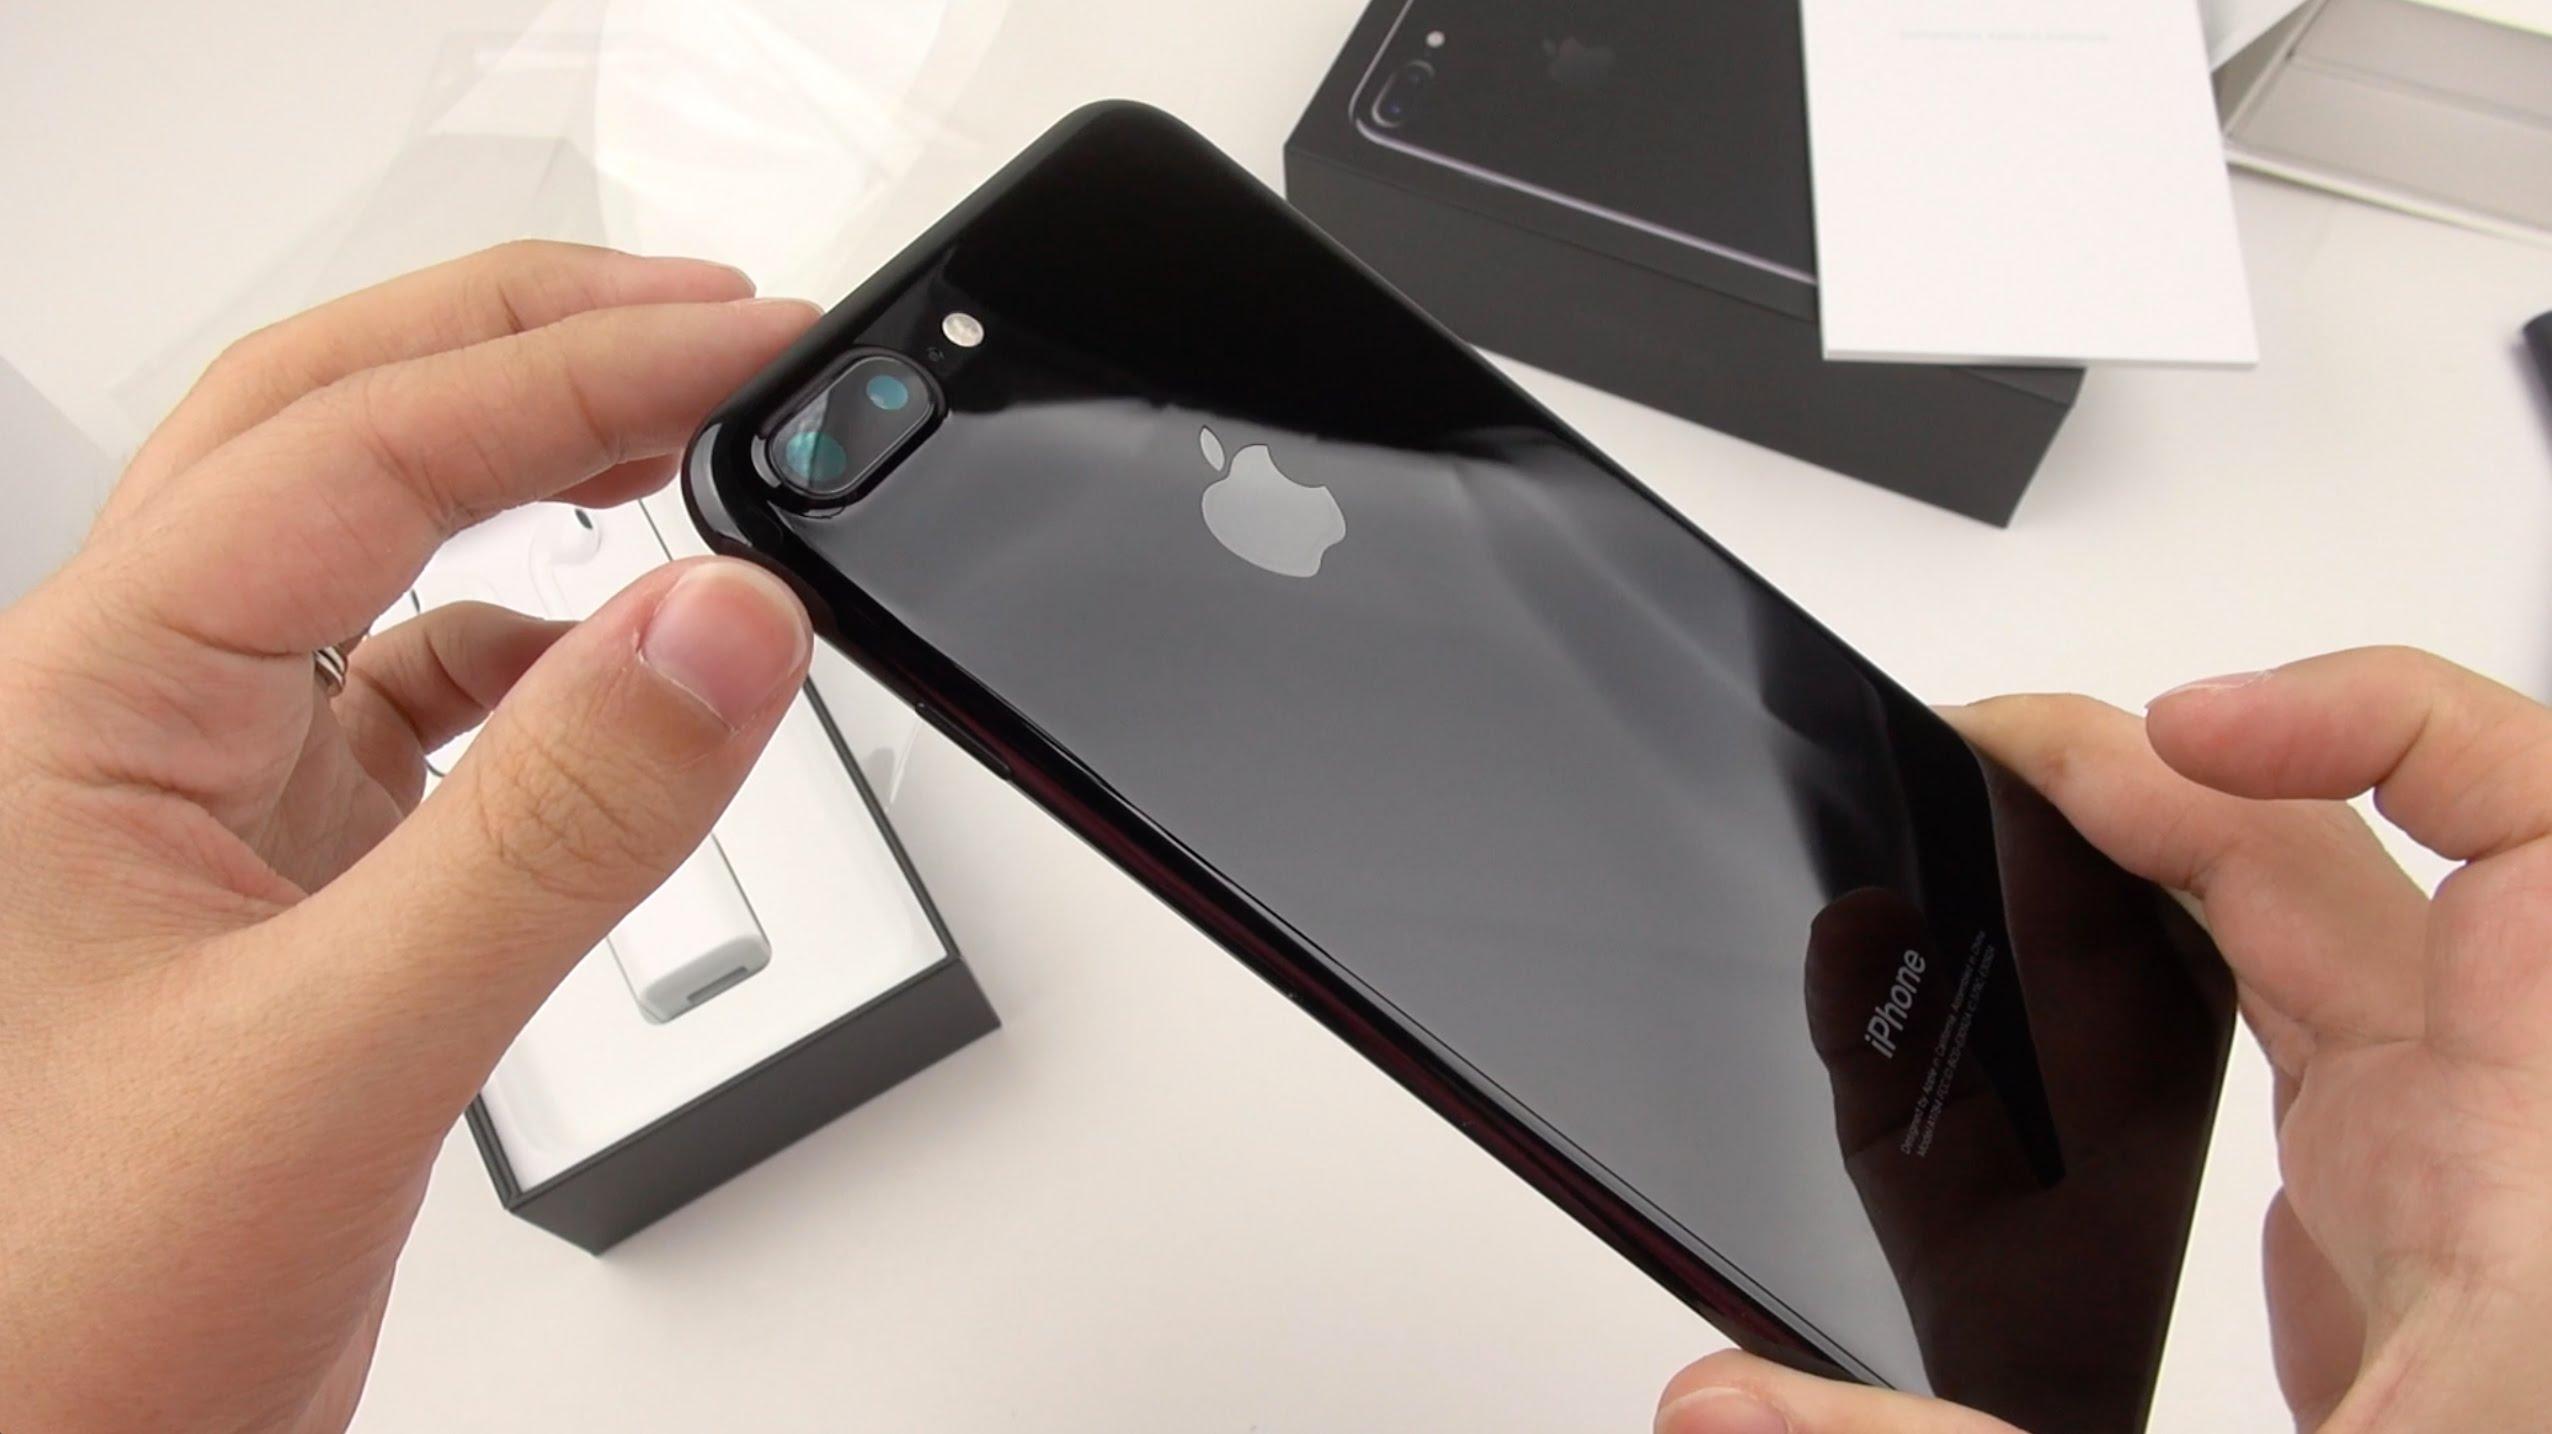 iPhone 7 Plus sistema operativo